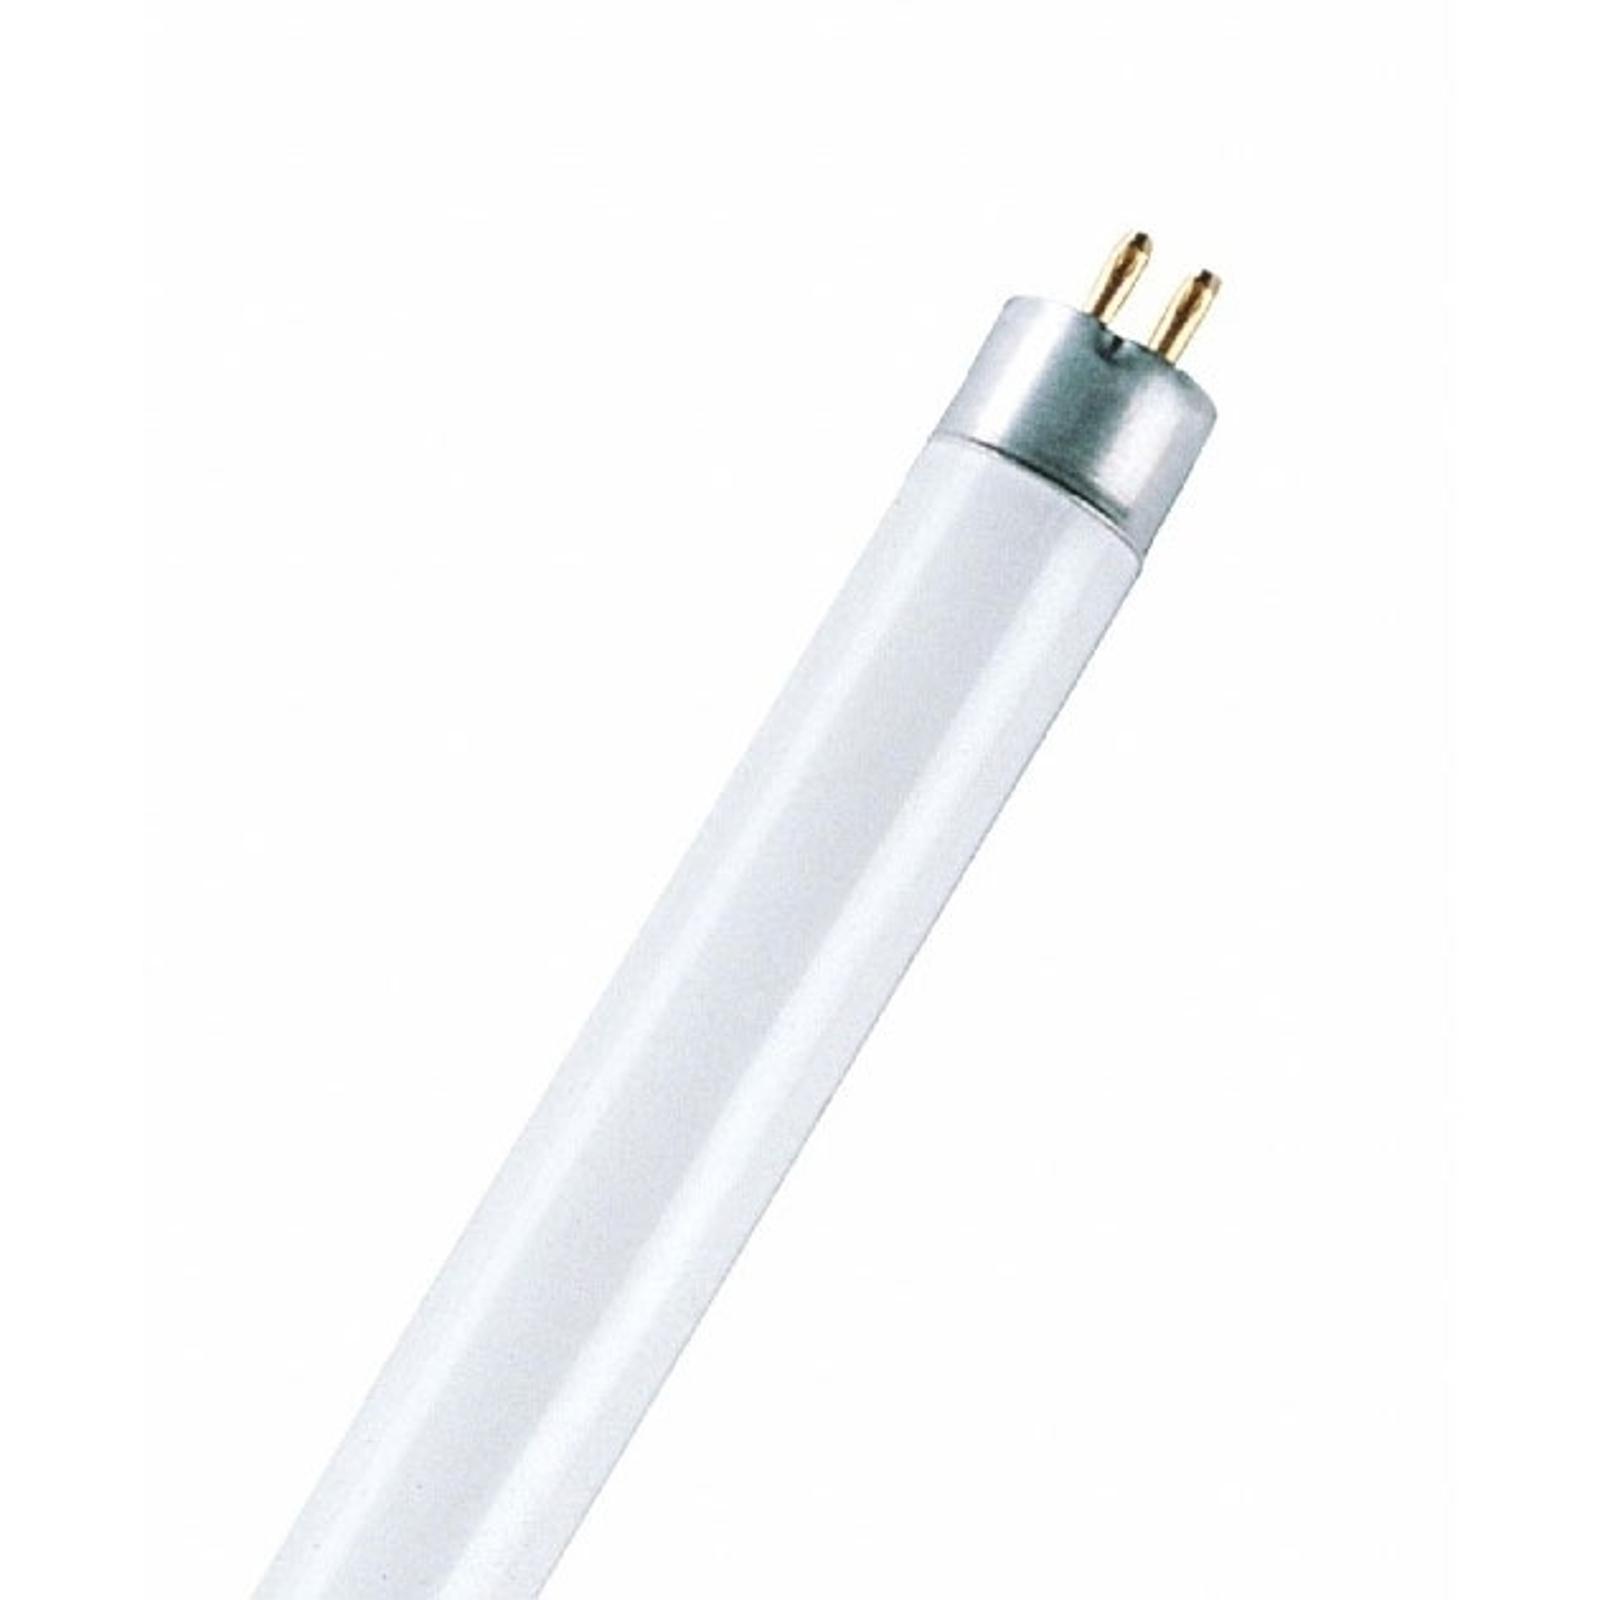 Osram Emergency Lighting G5 T5 840 6W